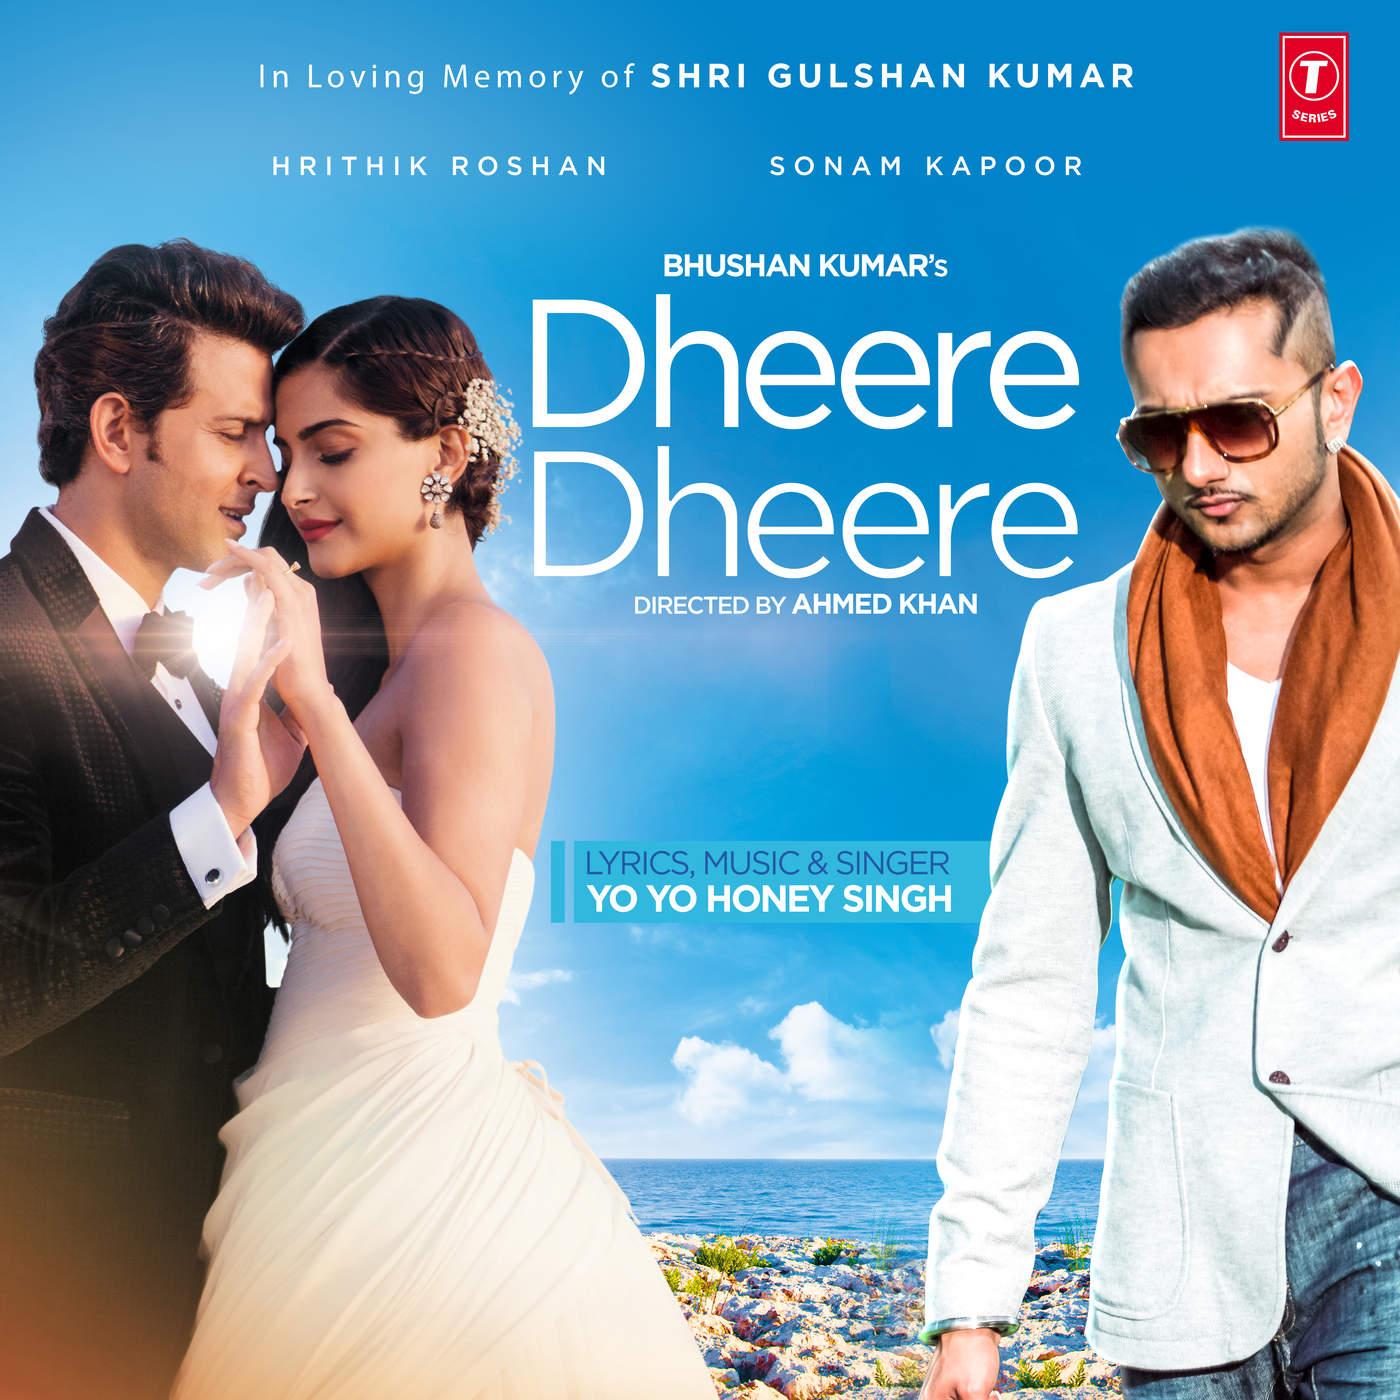 Yo Yo Honey Singh  - Dheere Dheere - Single